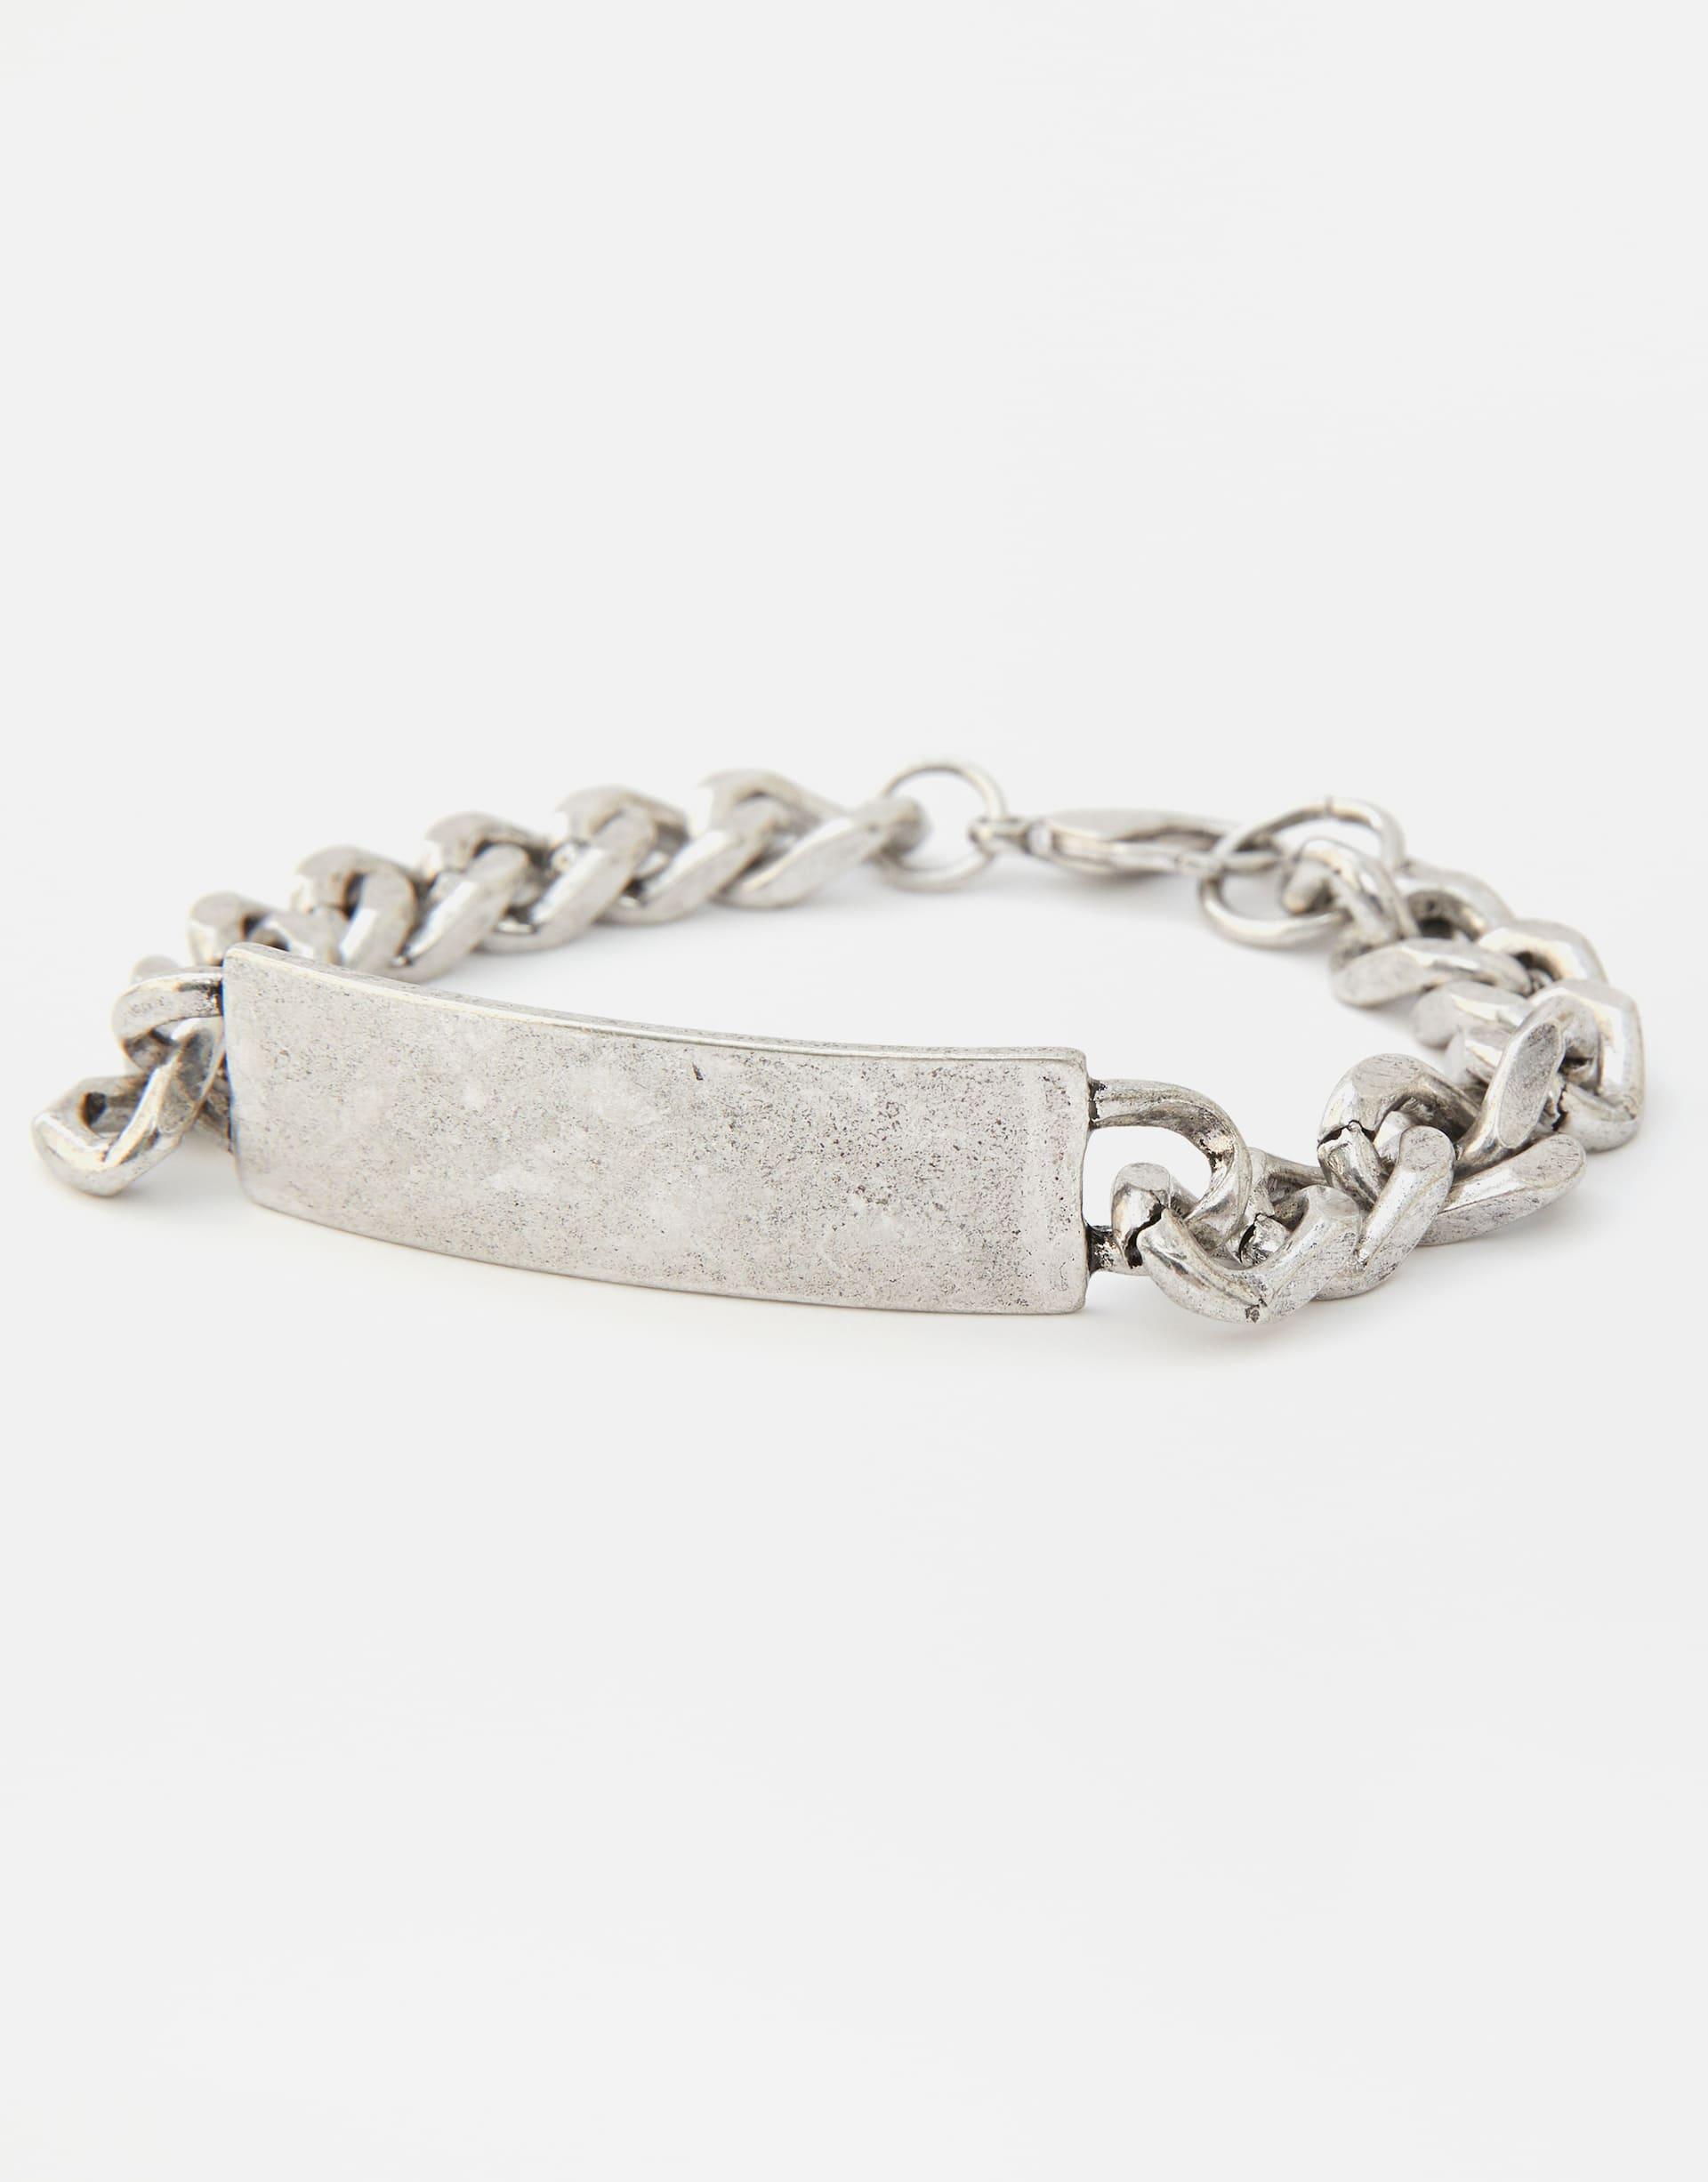 93336b069299b Silver chain link bracelet